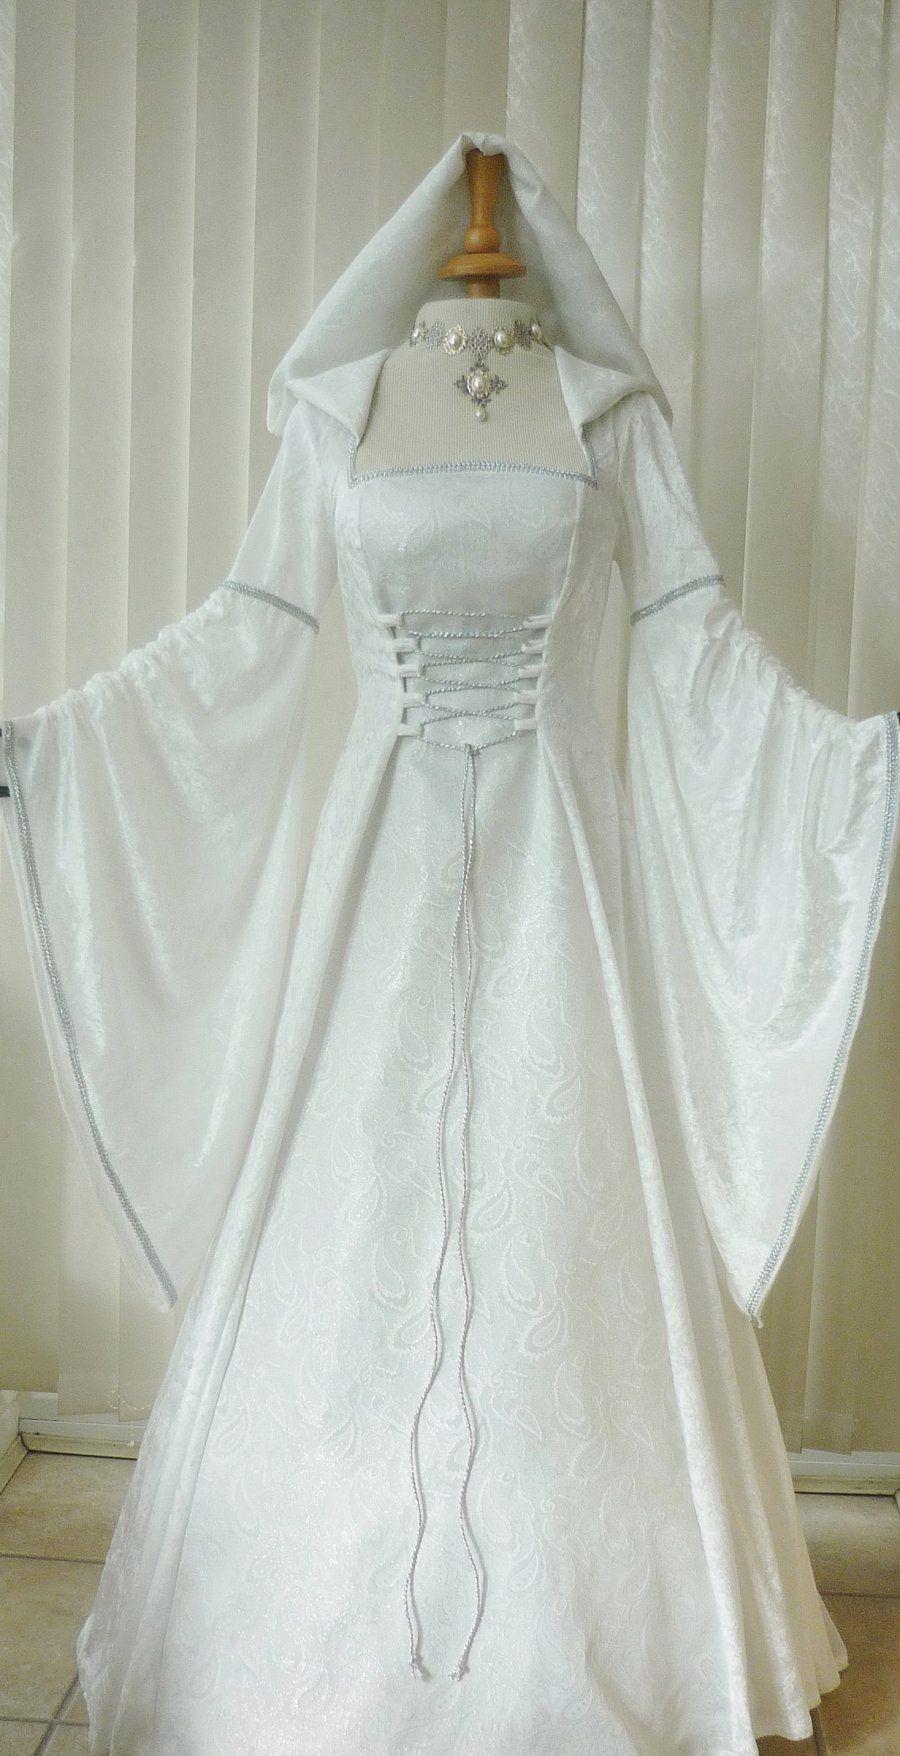 medieval wedding dress Medieval Pagan Renaissance Ivory Silver Hooded Wedding Dress Dawns Medieval Dresses